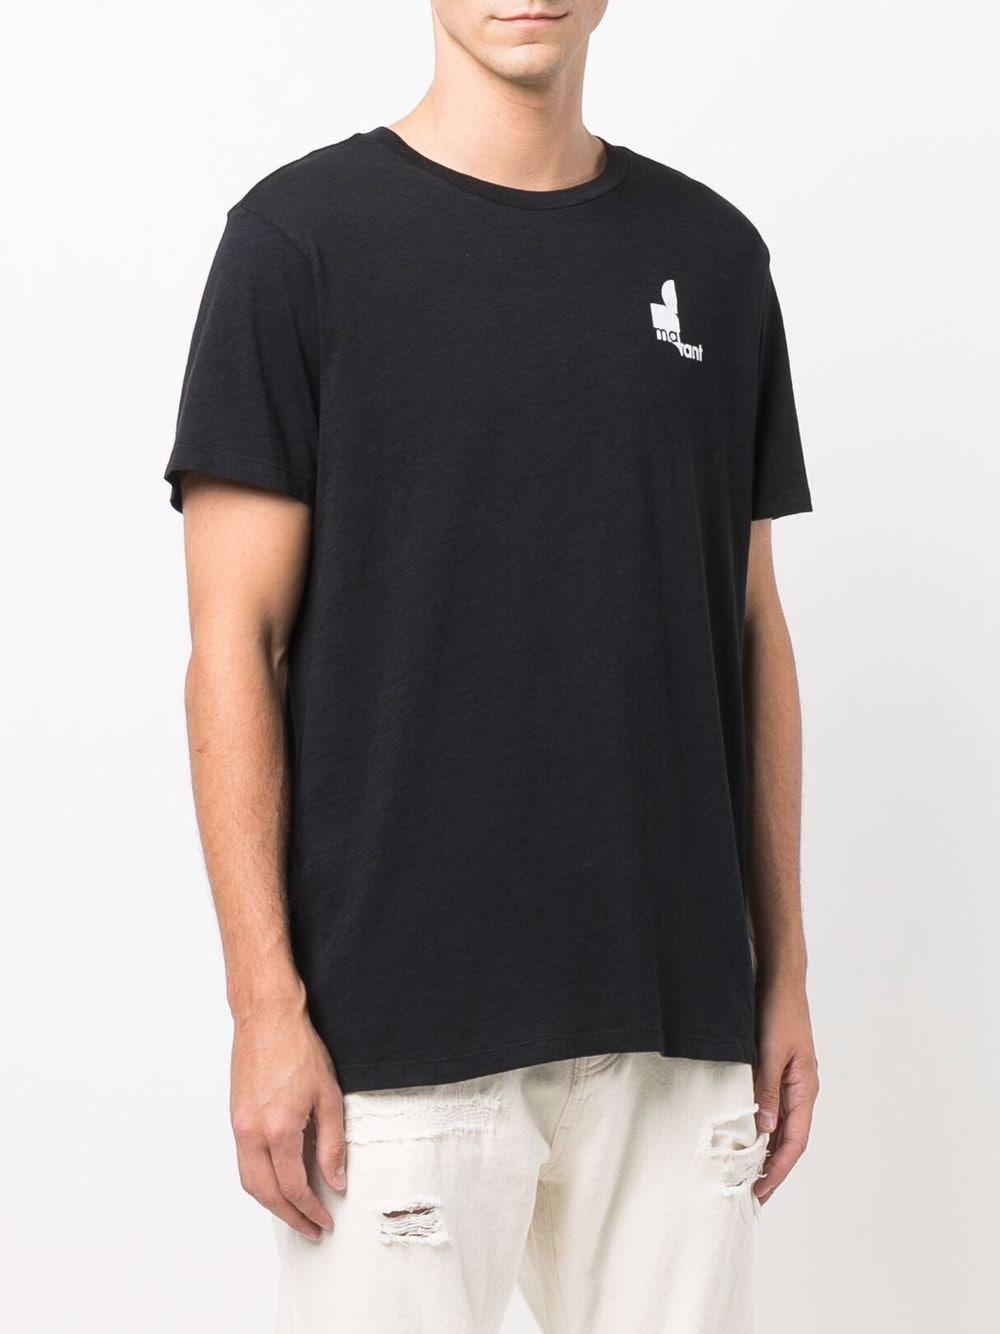 t-shirt zafferh uomo nera in cotone ISABEL MARANT   T-shirt   00MTS0433-00M900H01BK